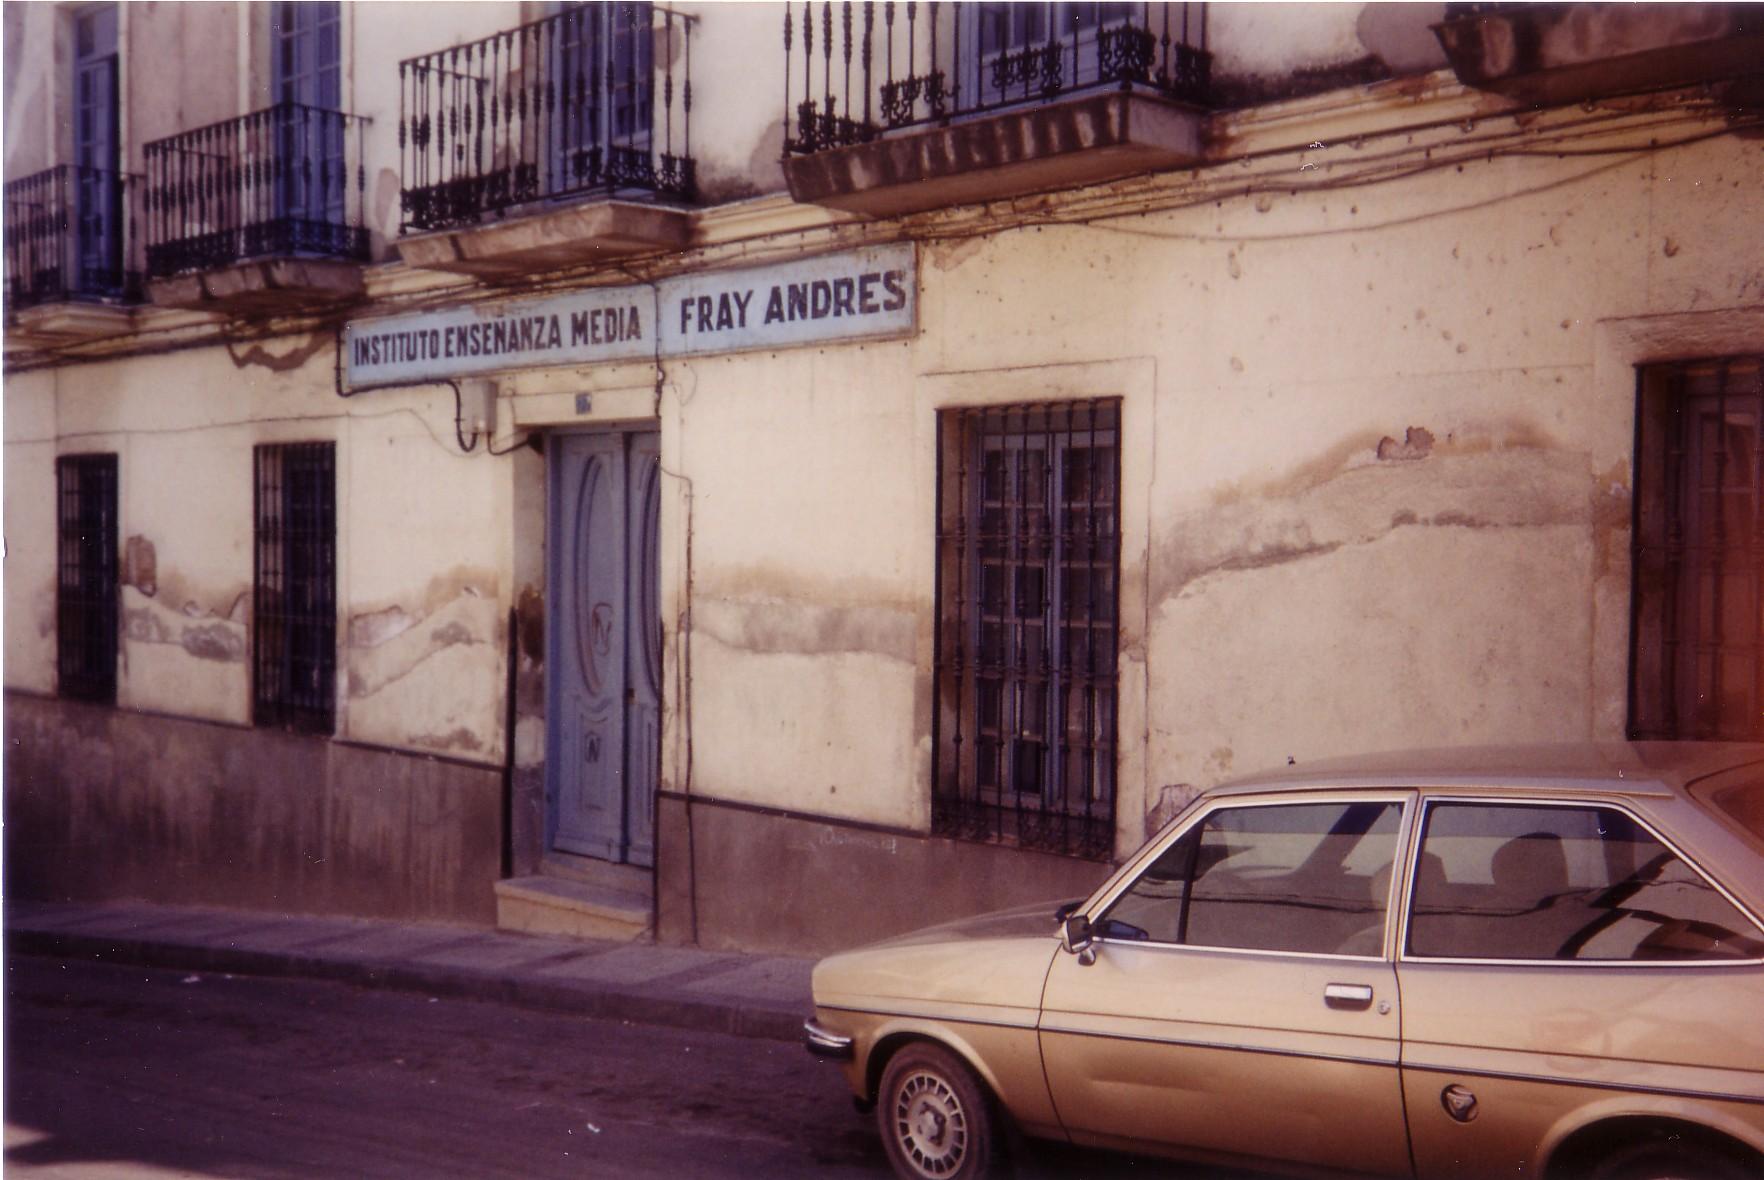 Instituto Fray Andrés Calle Torrecilla 1989 Fotografía F. Negrete